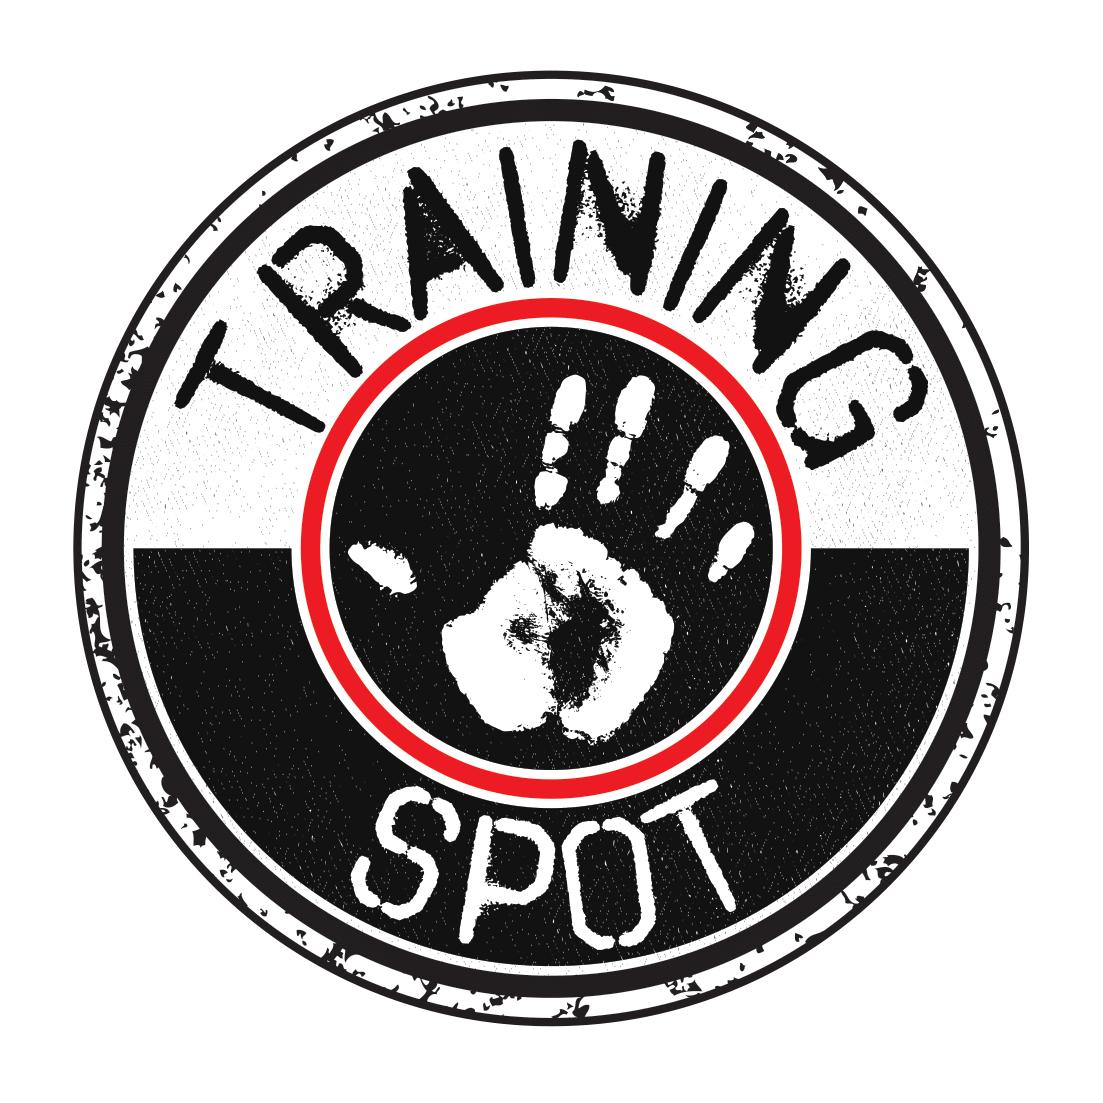 Training spot